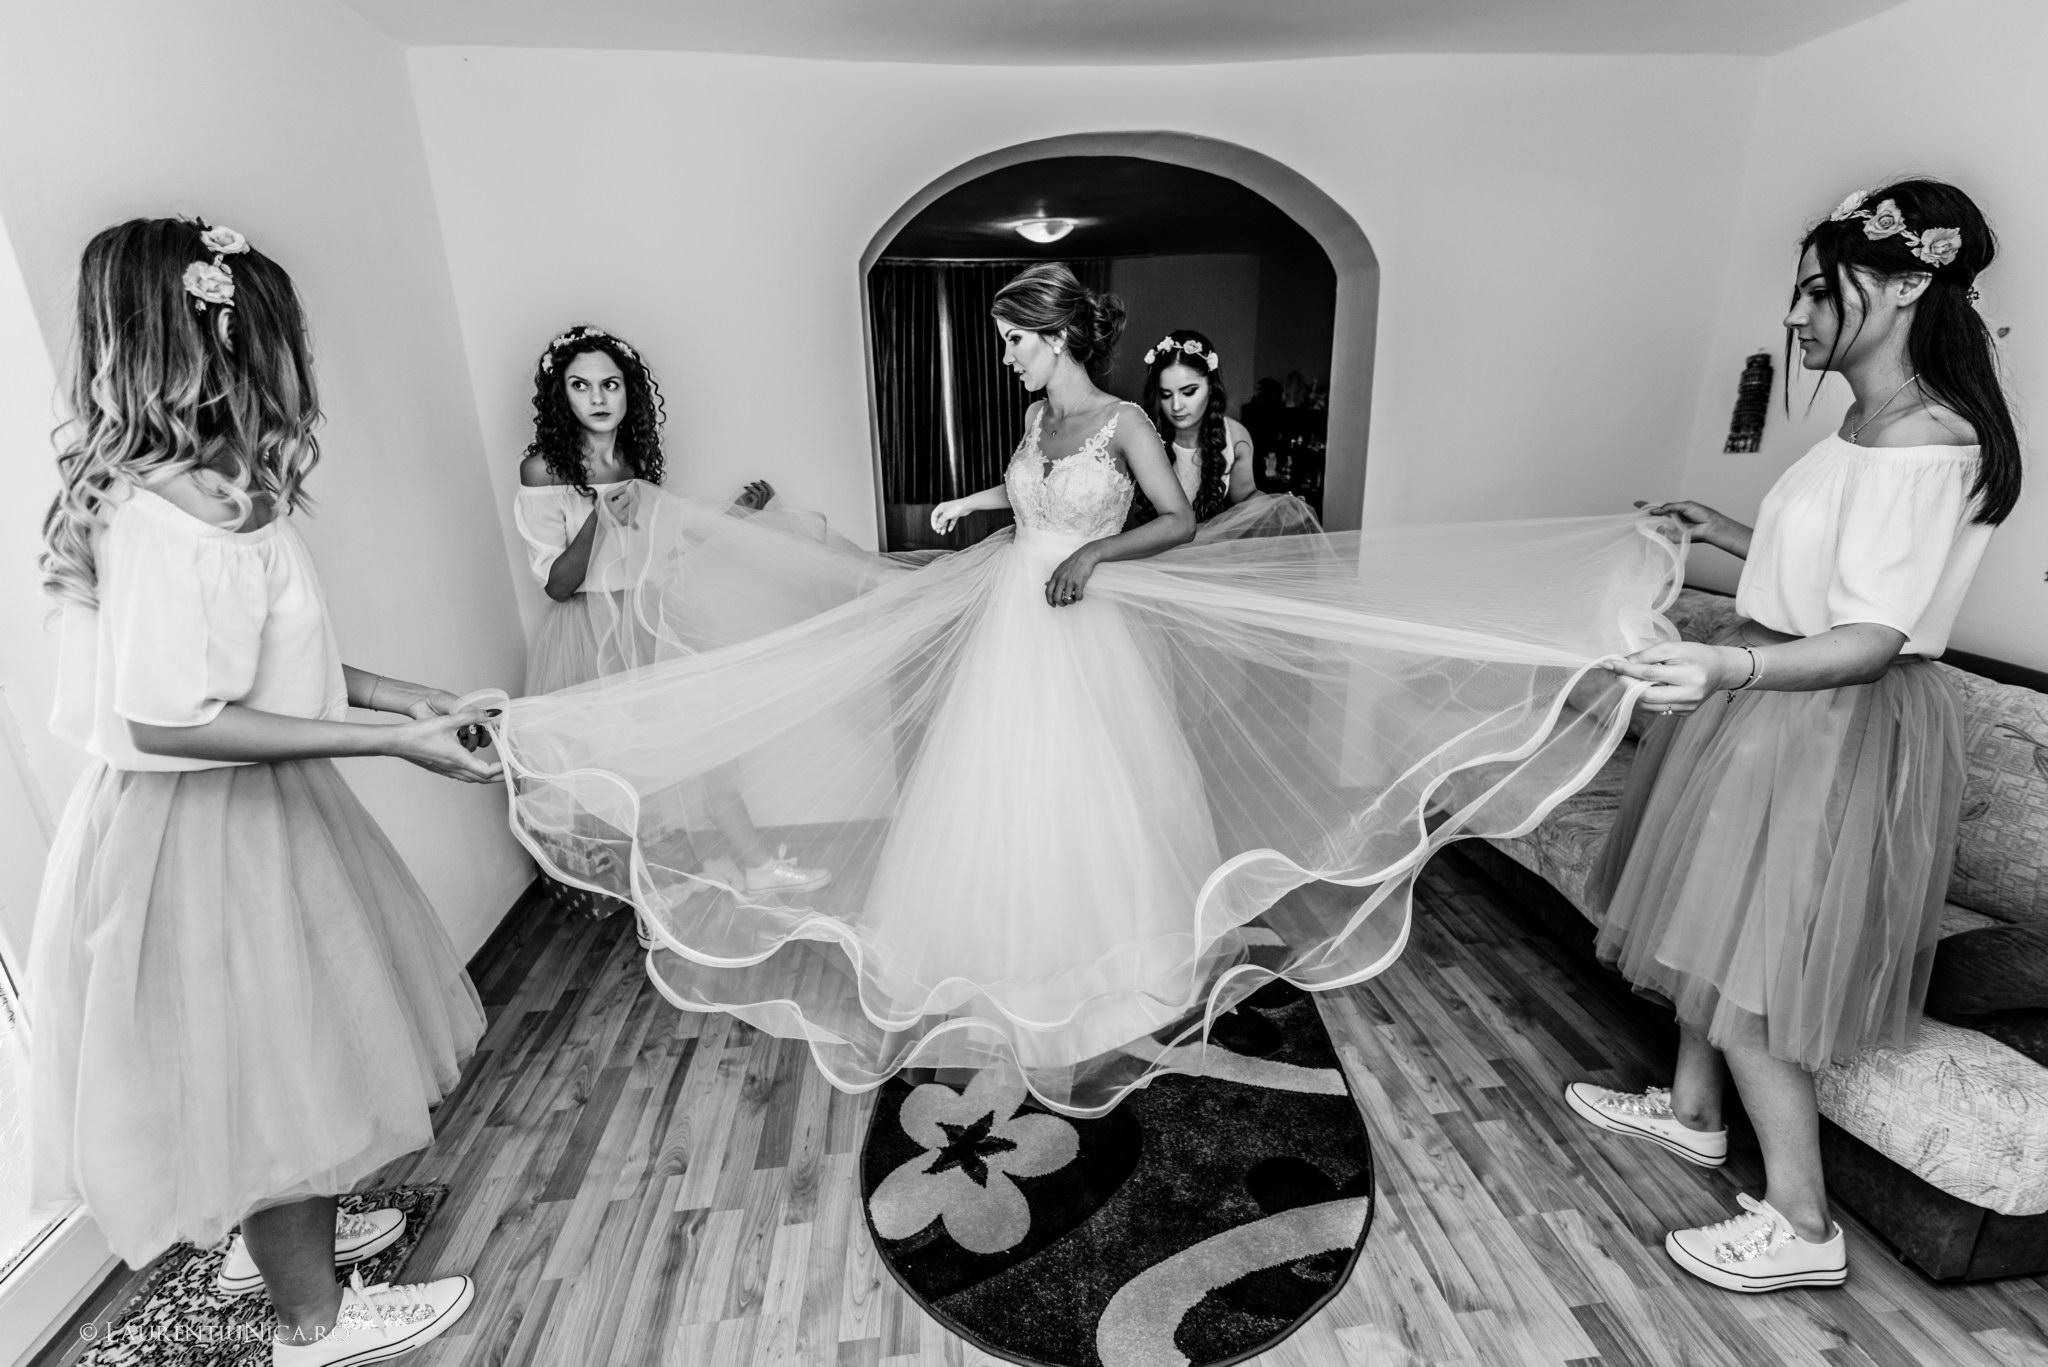 madalina madalin fotograf nunta laurentiu nica turceni gorj 02 - Madalina & Madalin | Fotografii nunta | Judetul Gorj